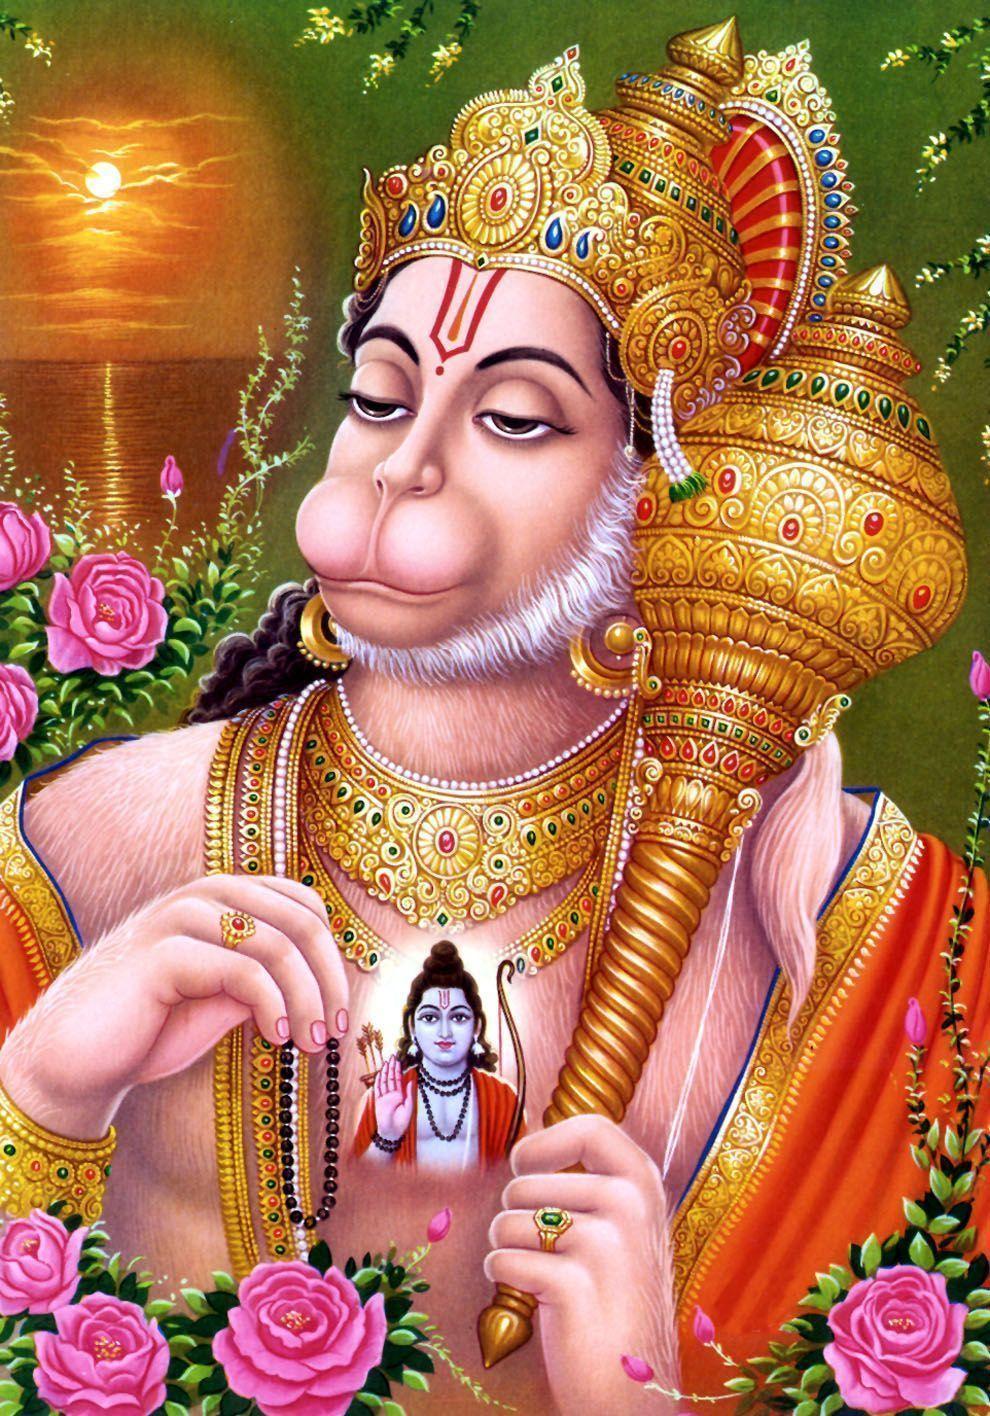 Hanuman dada HD wallpaper – Hindu God wallpaper